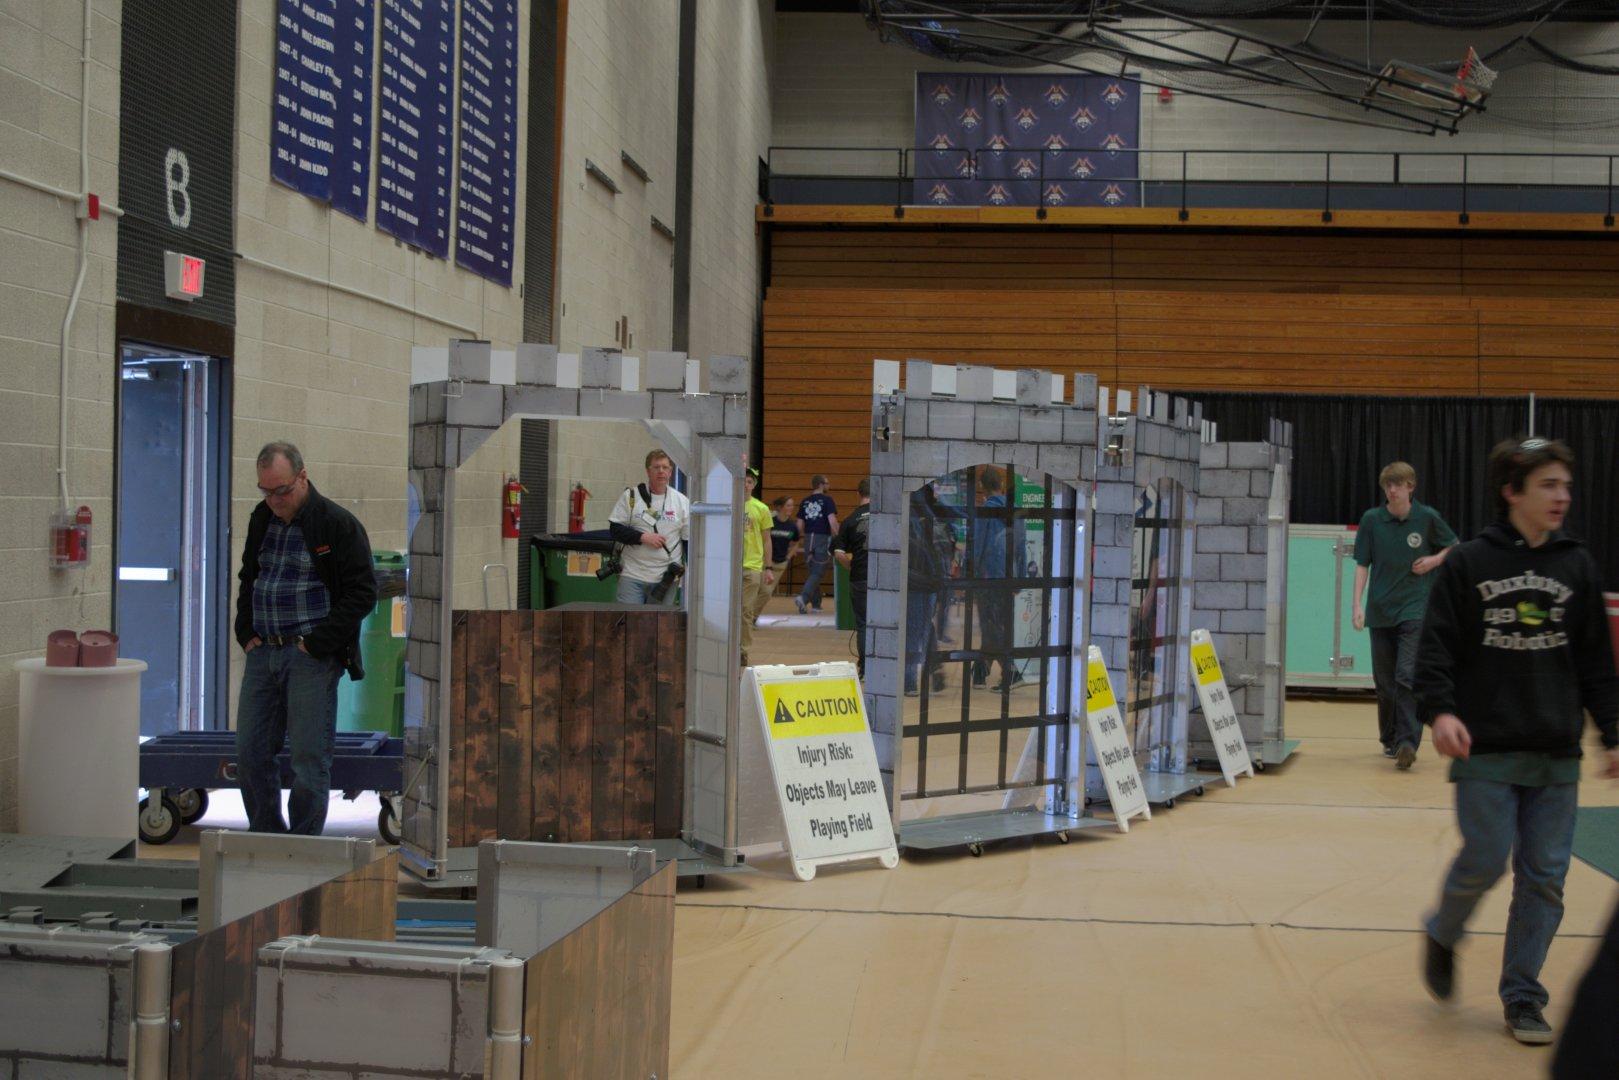 266-FIRST-Robotics-Competition-Umass-Dartmouth-March-18-20.2016-